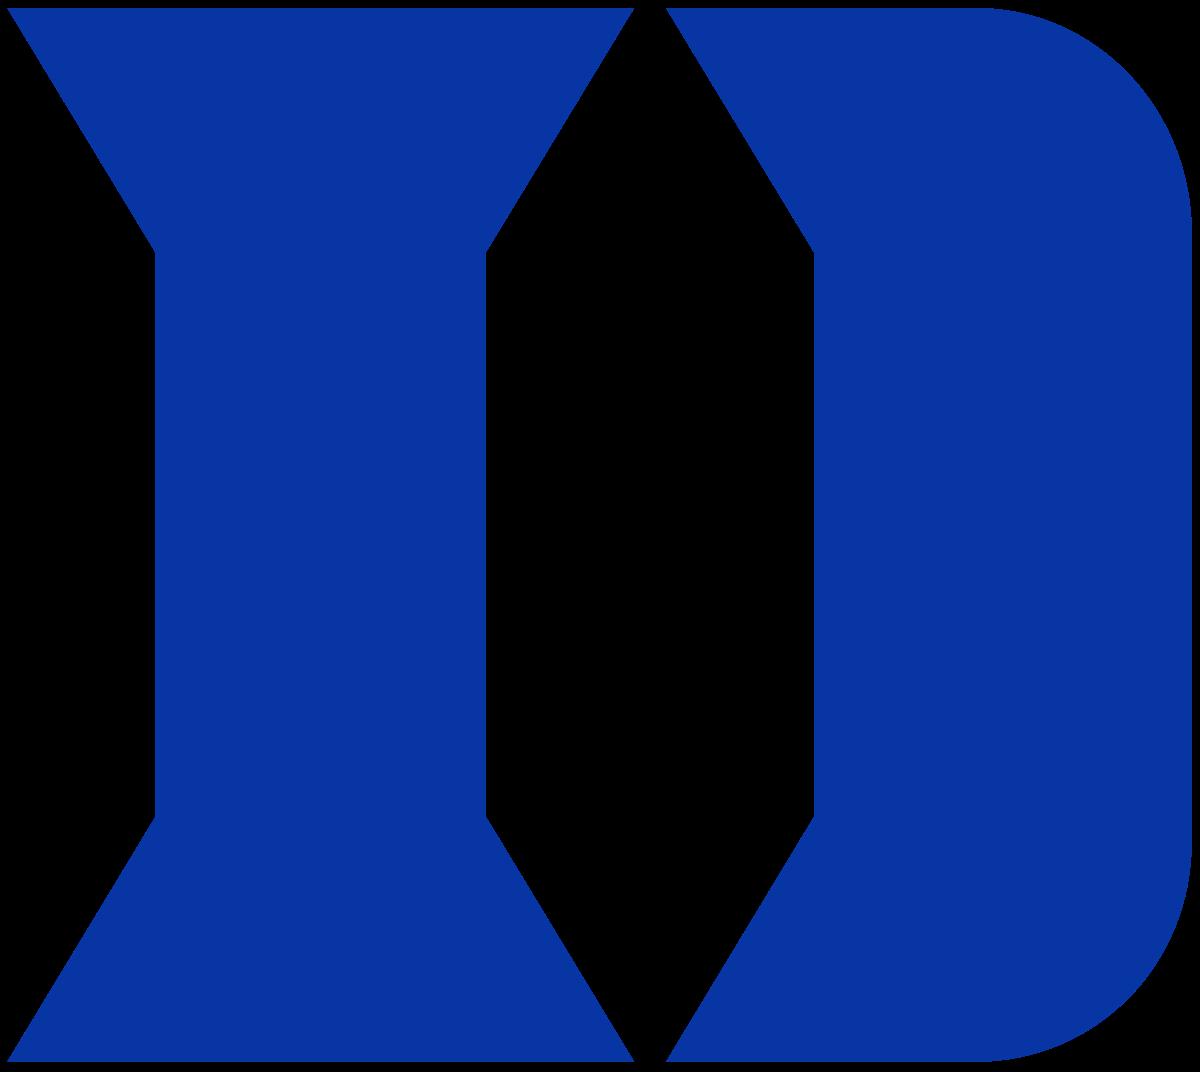 Lacrosse clipart men's. Duke blue devils wikipedia